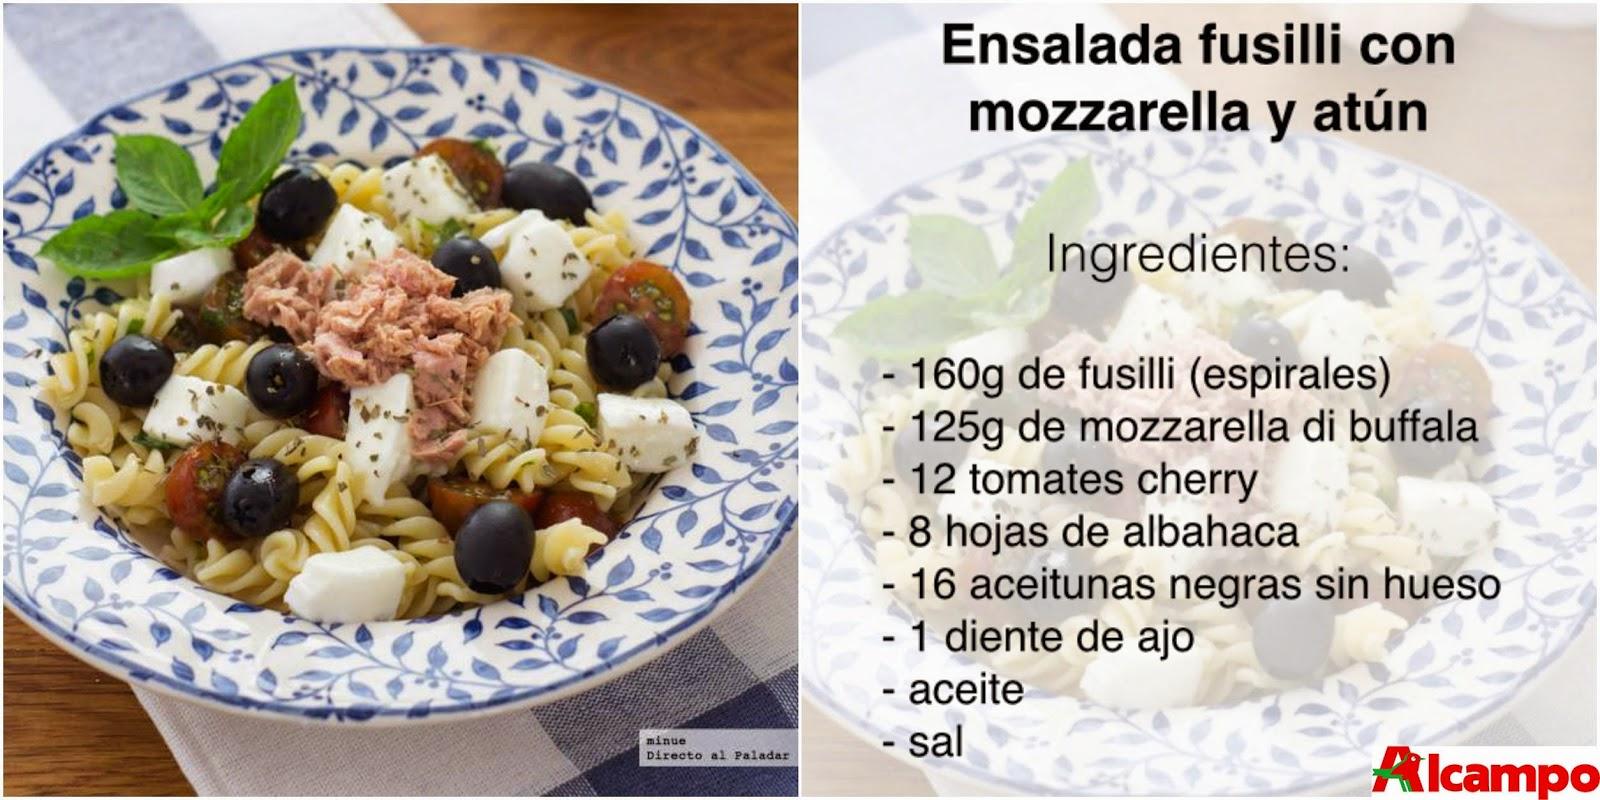 Ensalada Mozzarella Fusilli